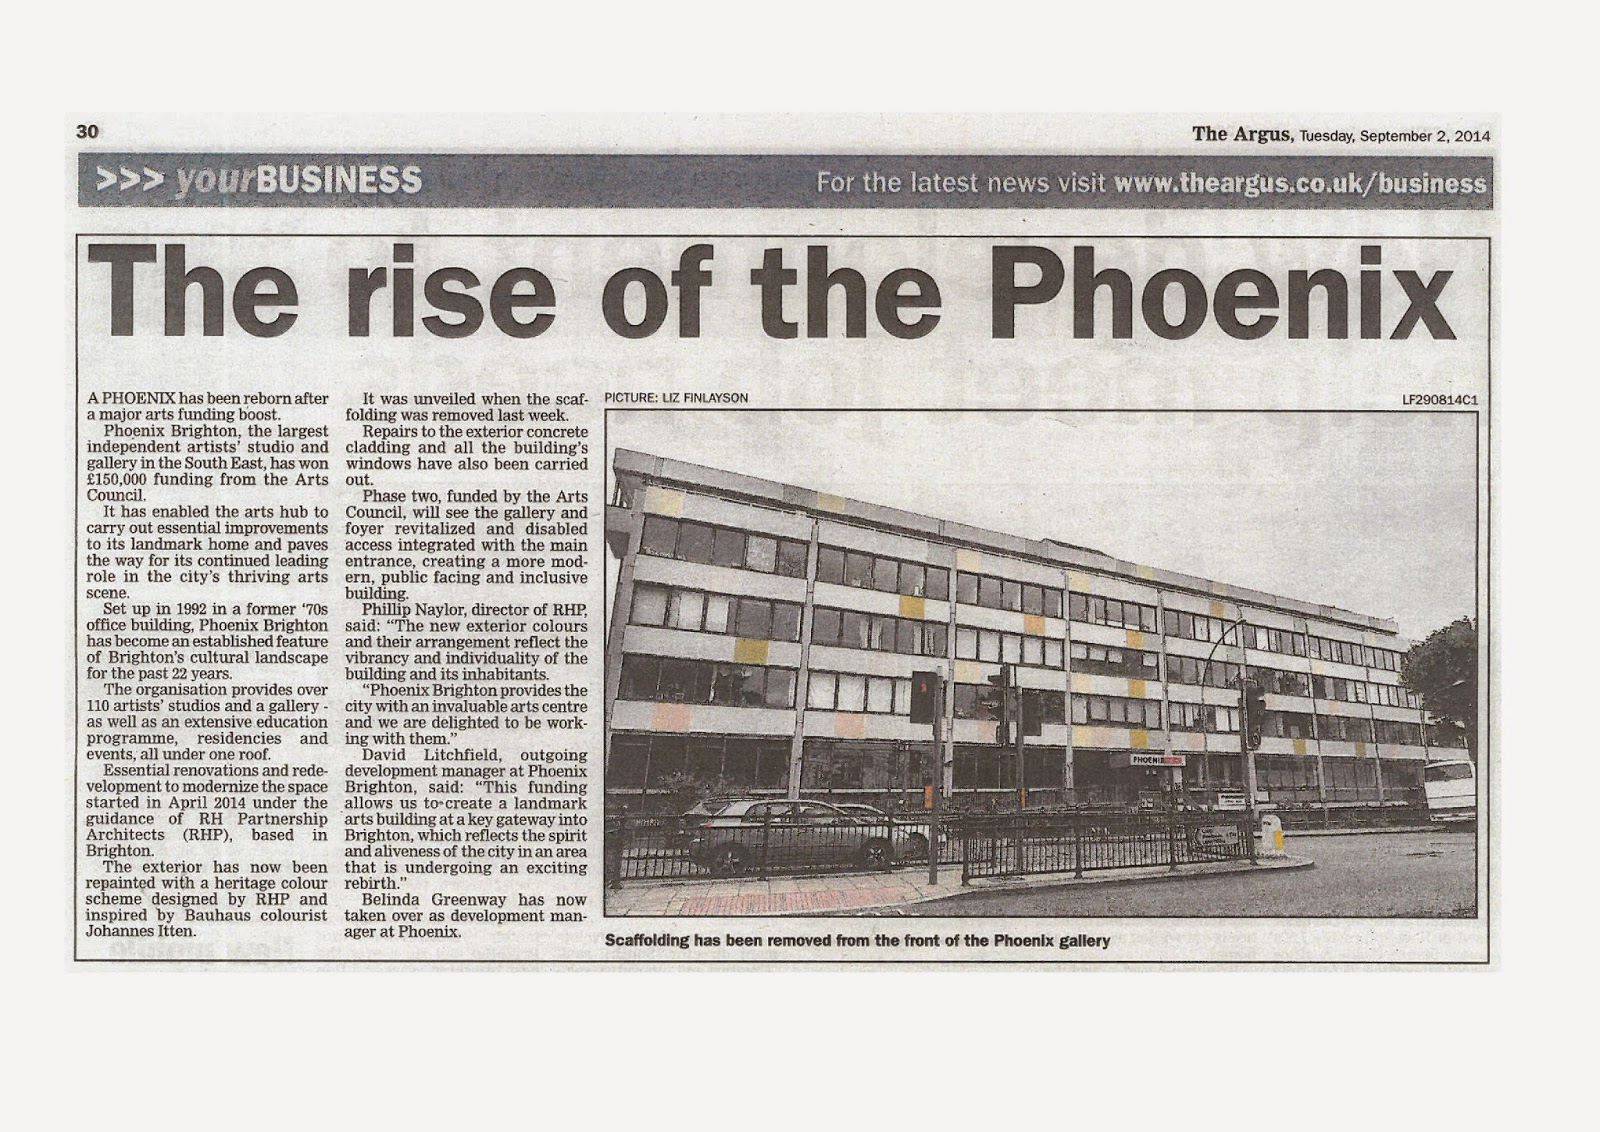 Phoenix Brighton reborn with Arts Council funding